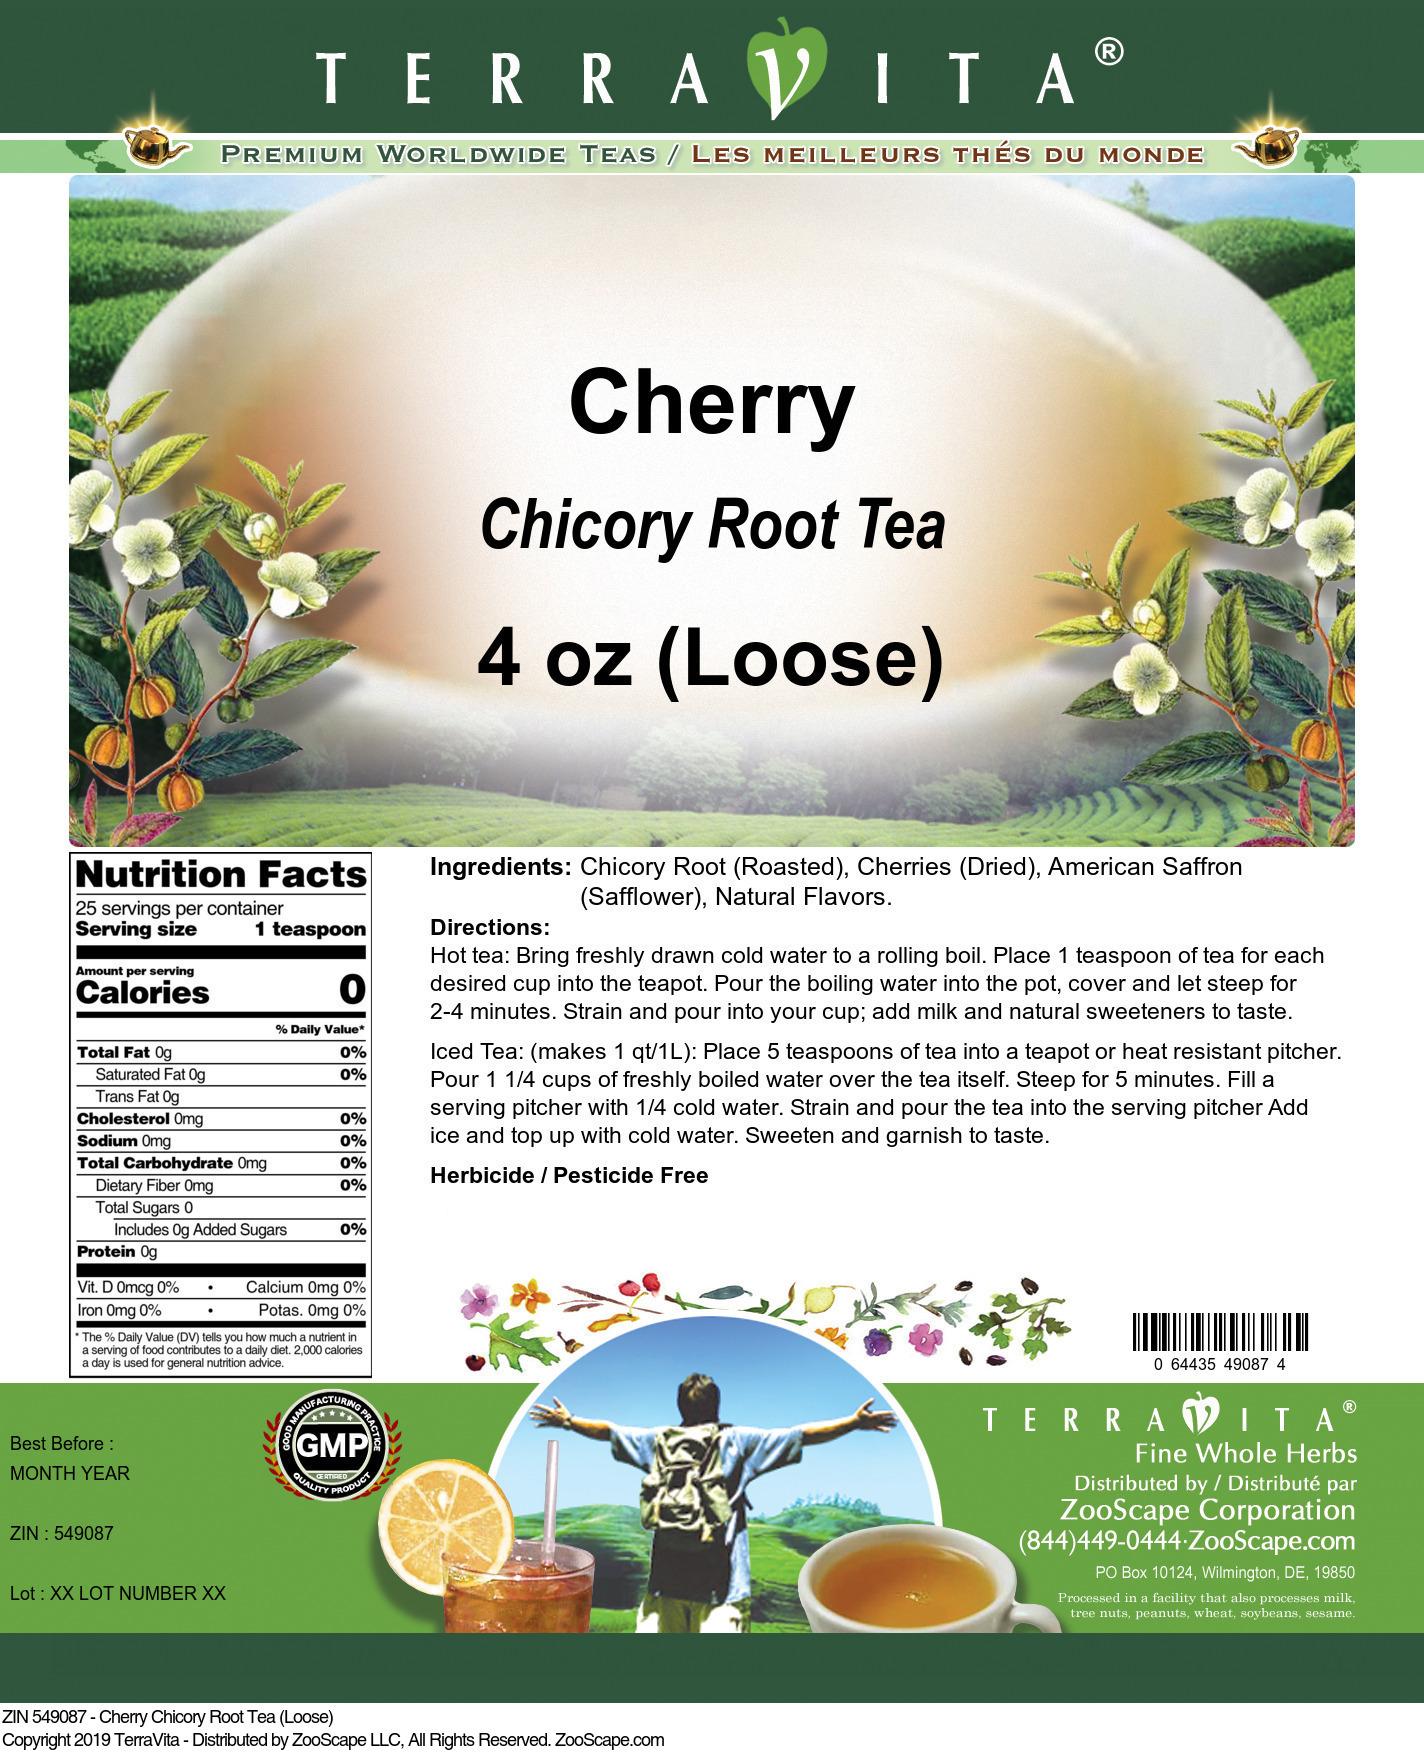 Cherry Chicory Root Tea (Loose)